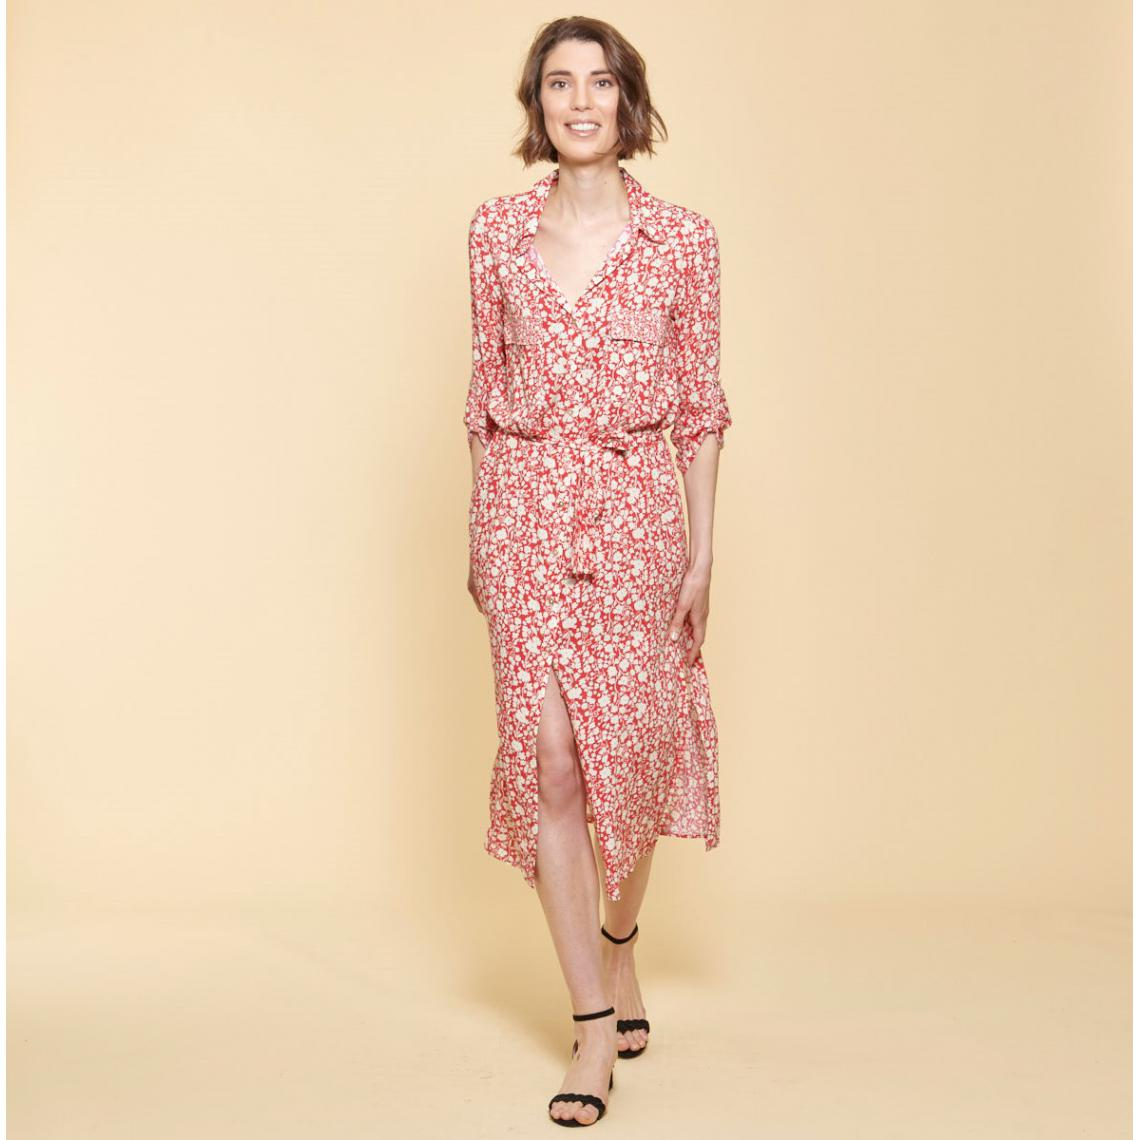 Robe chemise longue ceinturee - 3Suisses